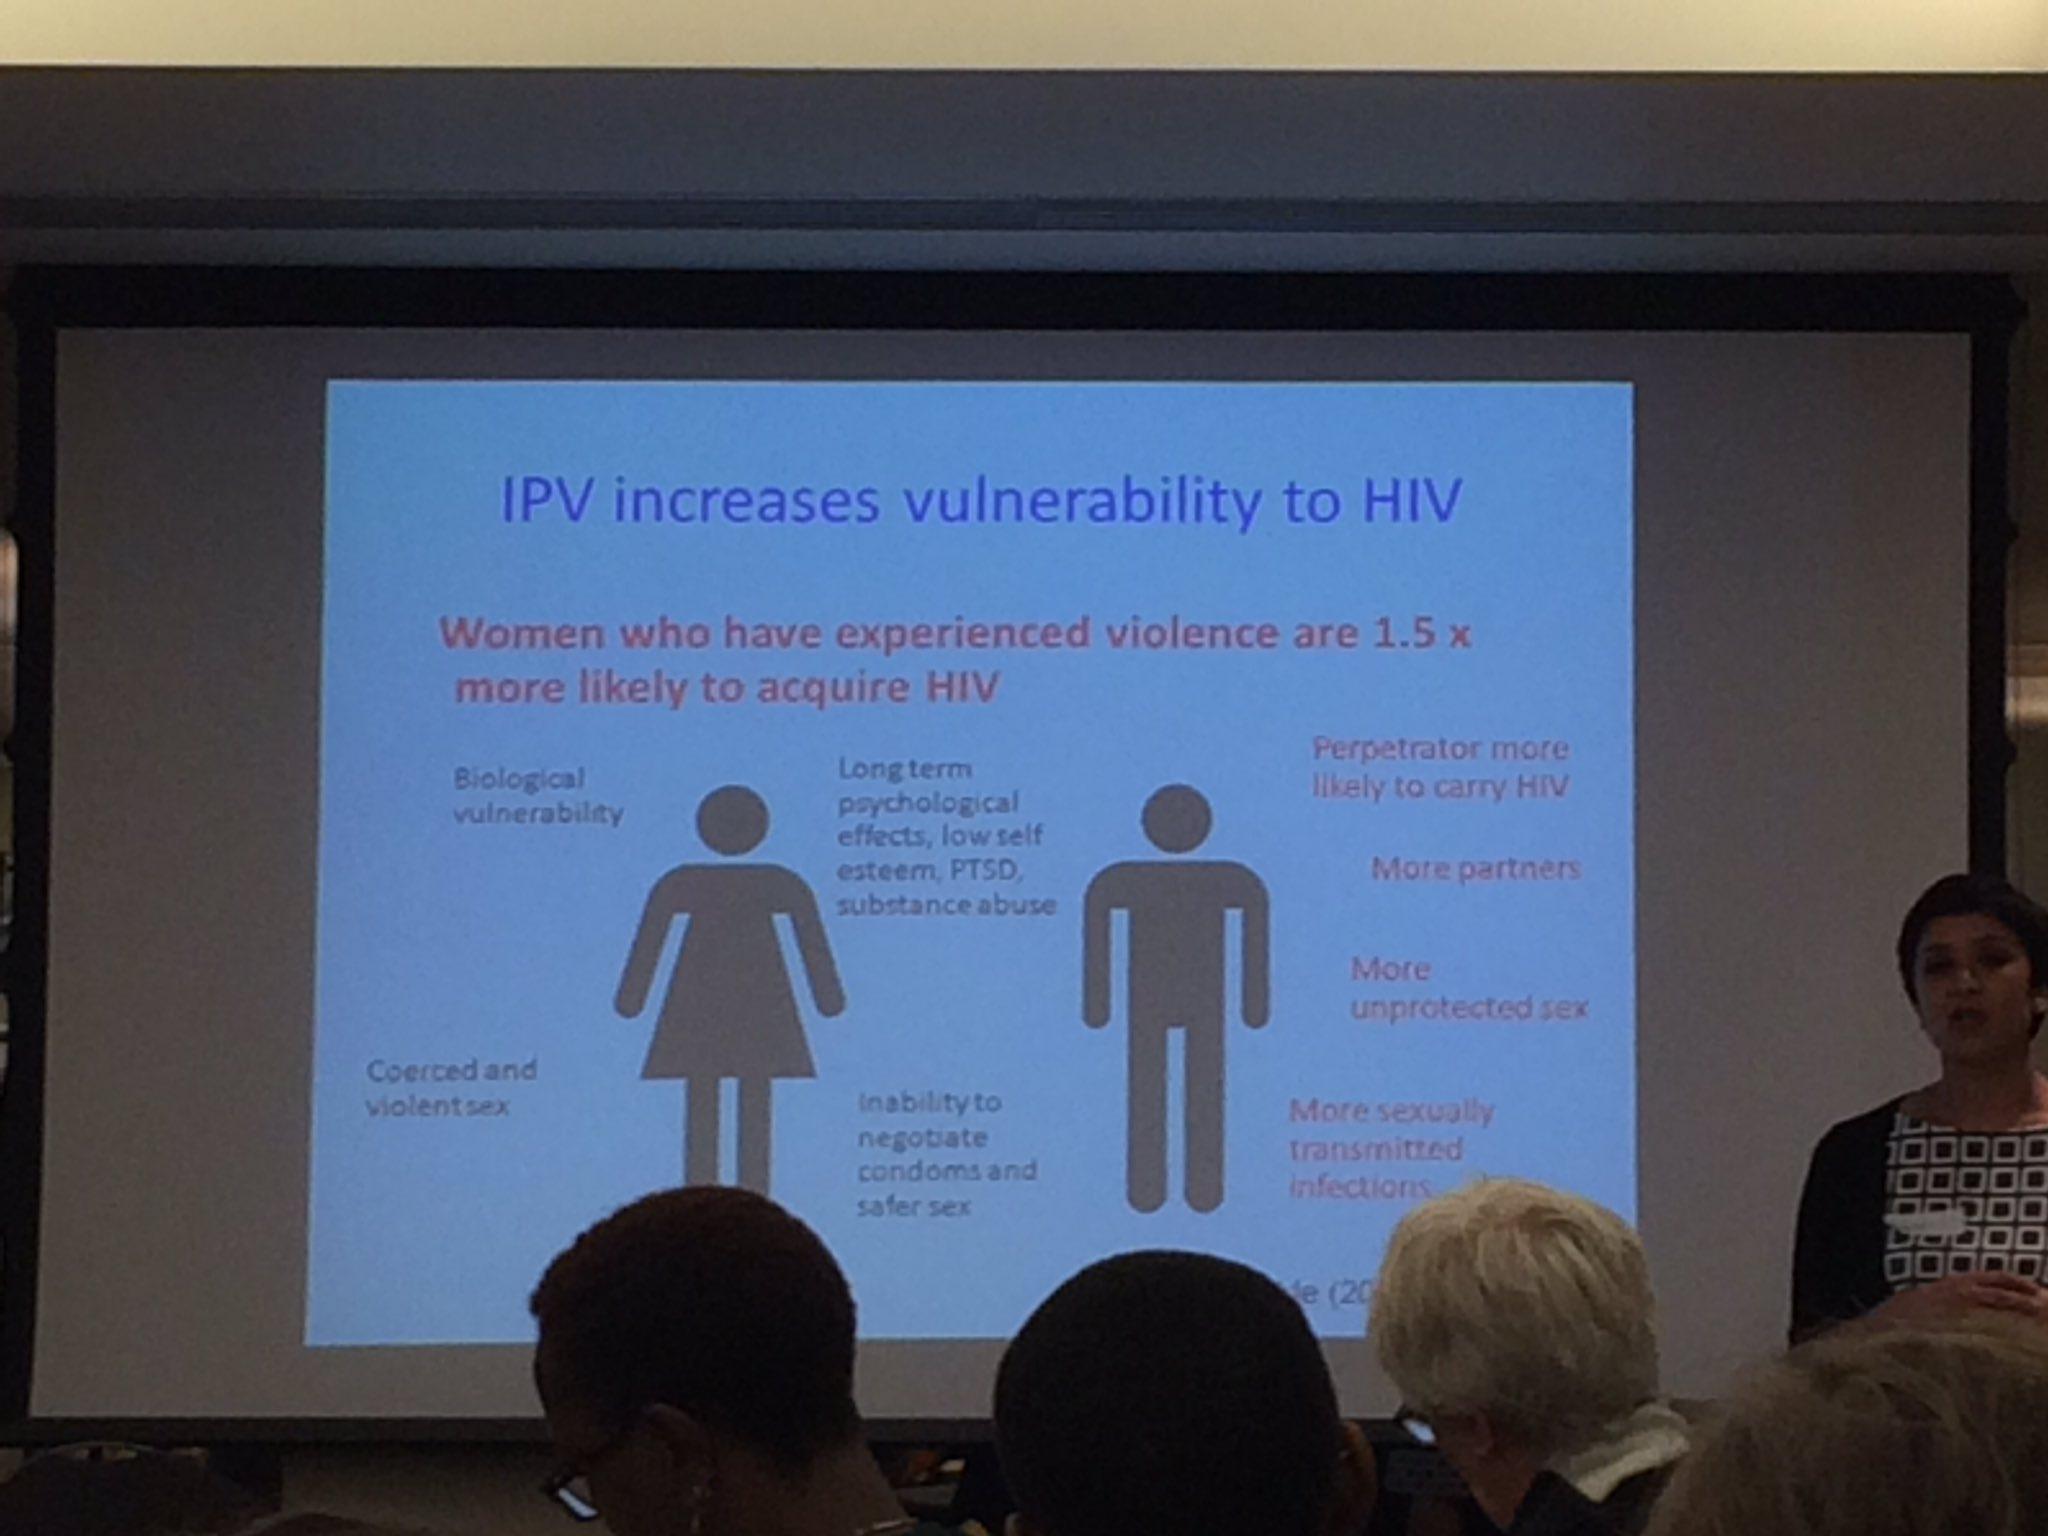 @crageshri talking about #IPV increasing risk to #HIV #swiftwomen @SWIFT_women https://t.co/V7UwRTG908